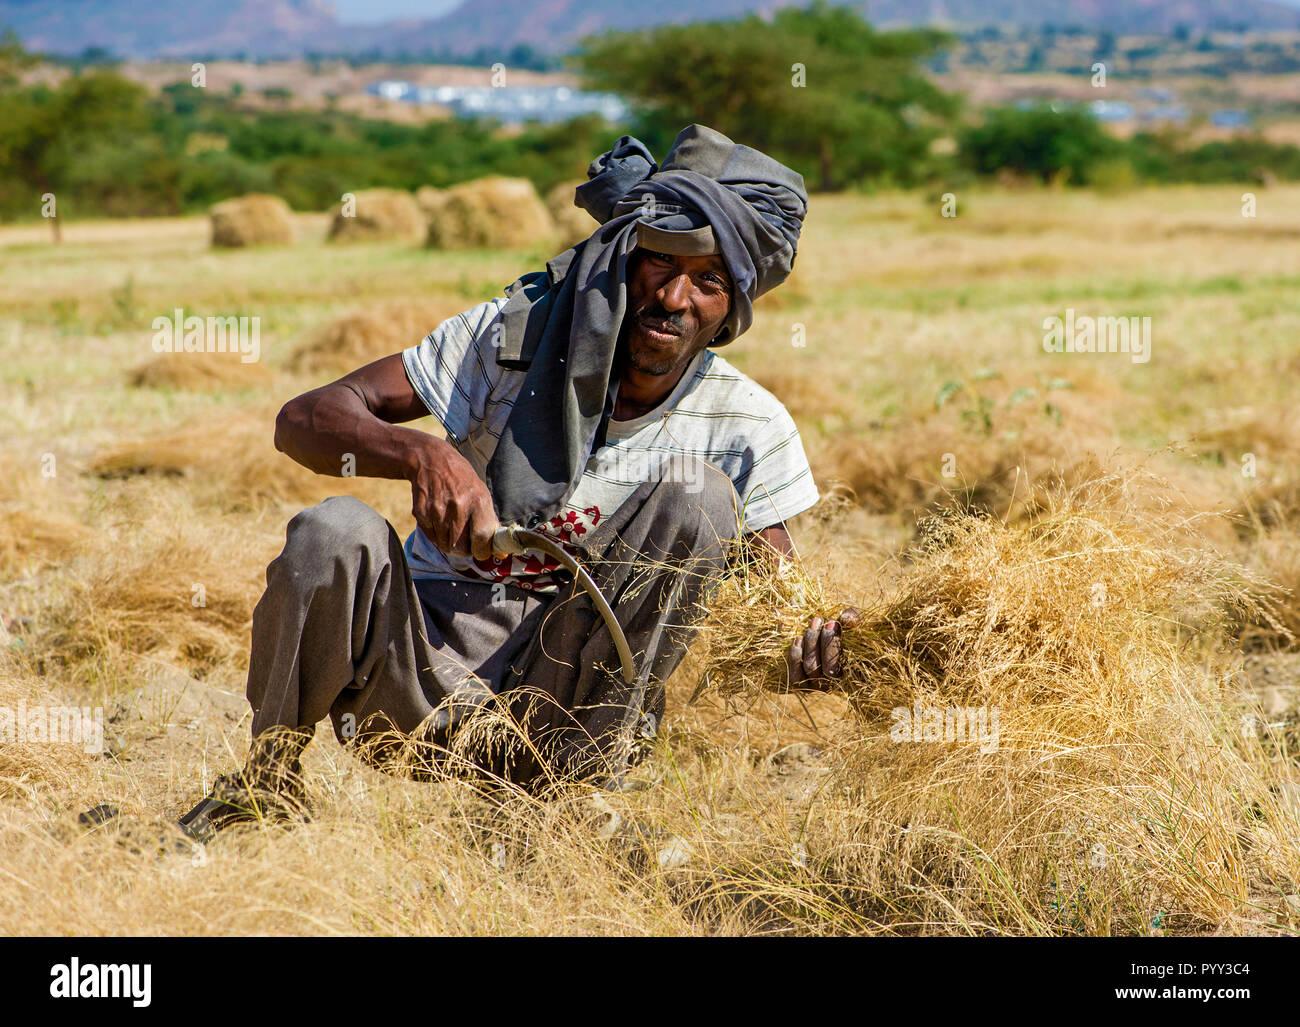 Farmer harvesting Teff (Eragrostis tef) with the sickle, Hawzien, Tigray, Ethiopia - Stock Image